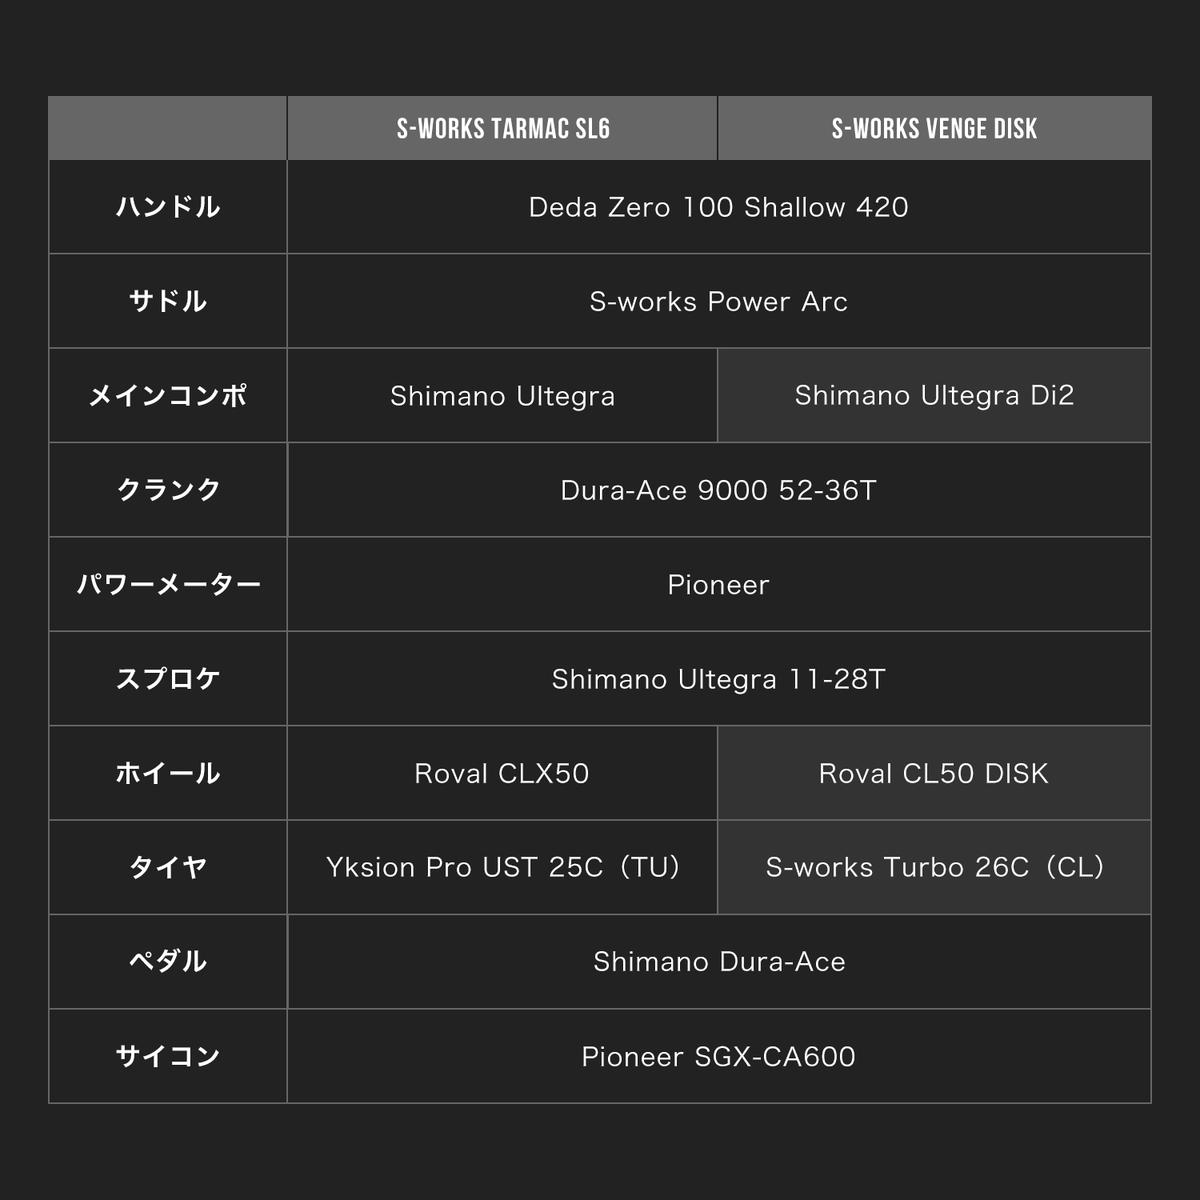 f:id:satoru-itabashi:20190507092642p:plain